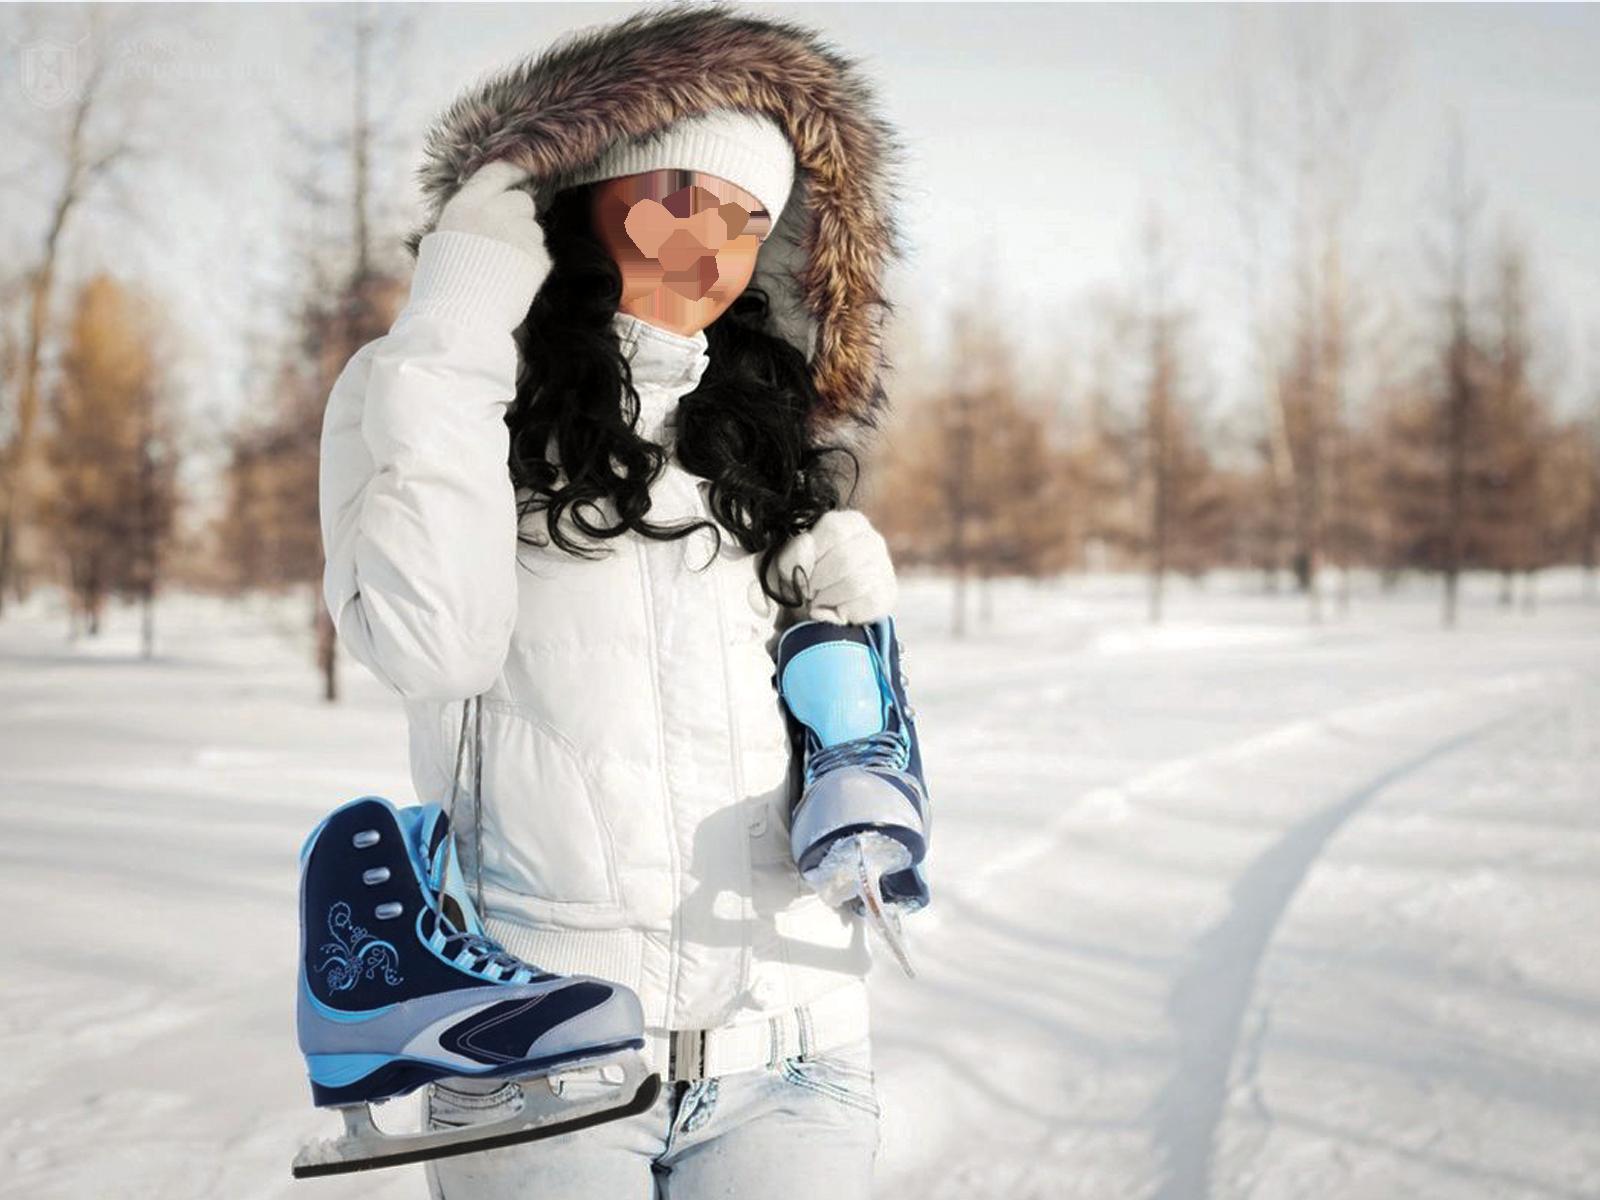 Фоторамка Девушка зимой, с коньками Фоторамка для фотошопа, PNG шаблон.